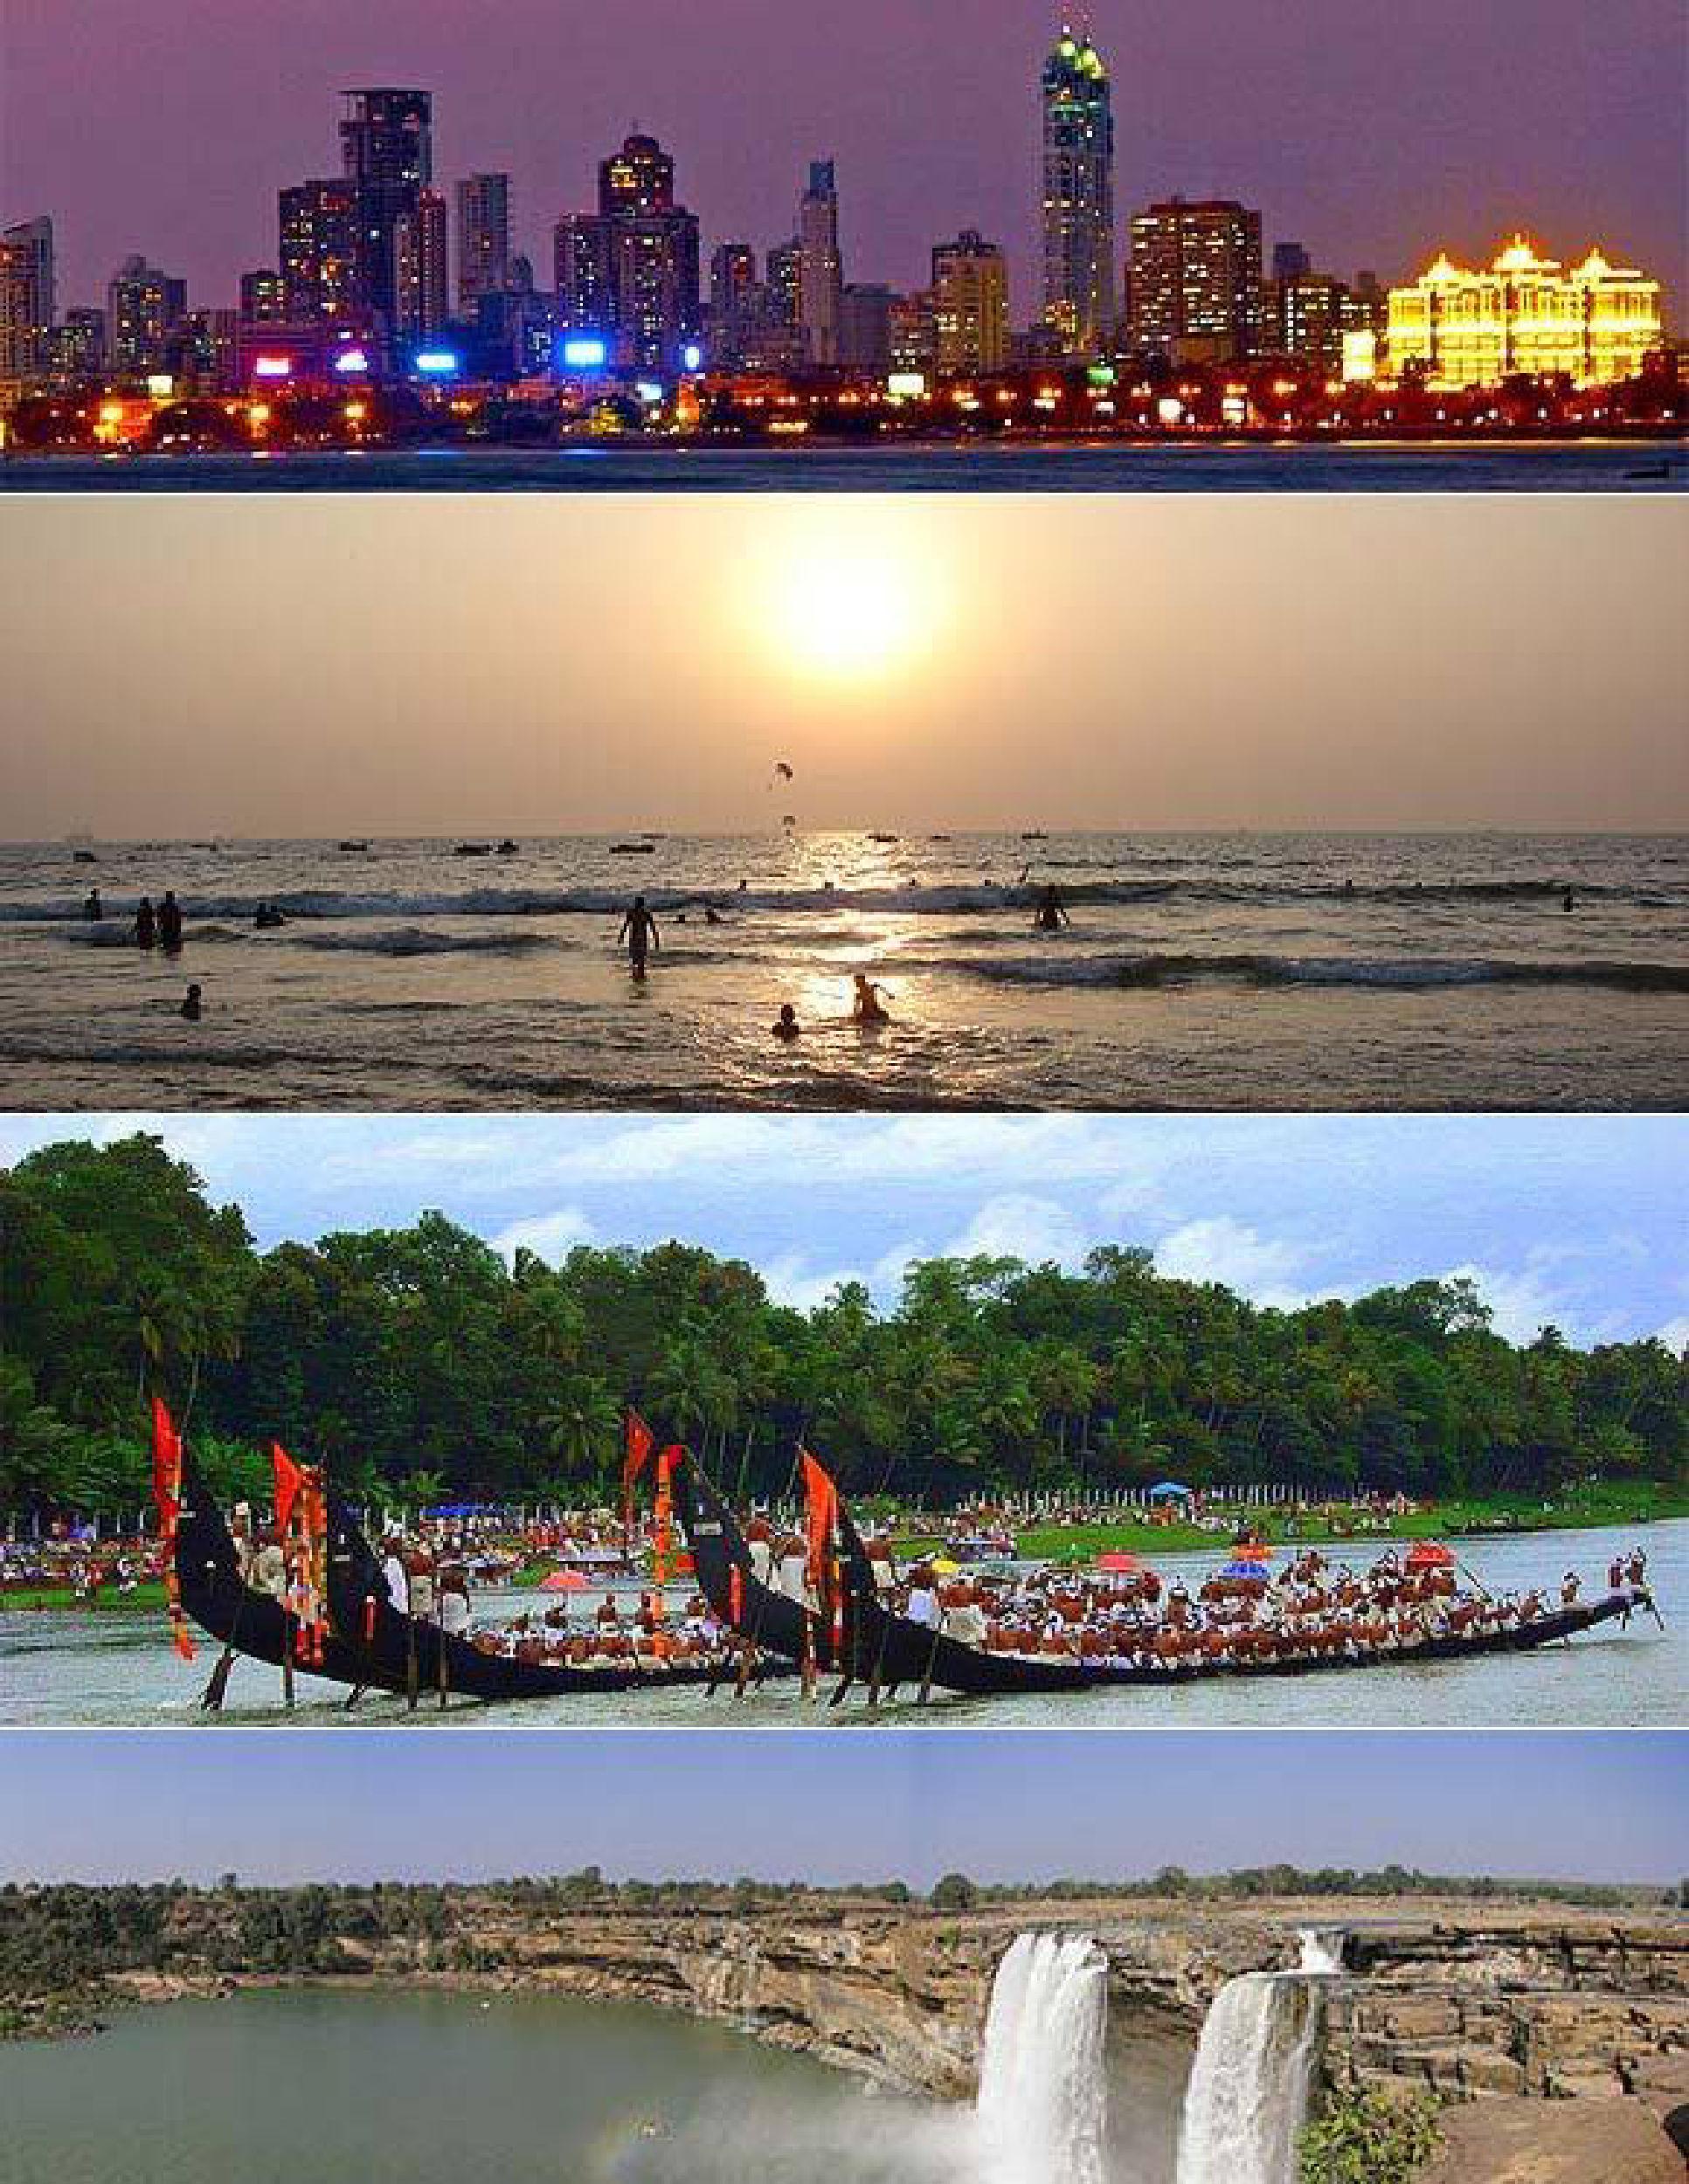 Indian capital cities